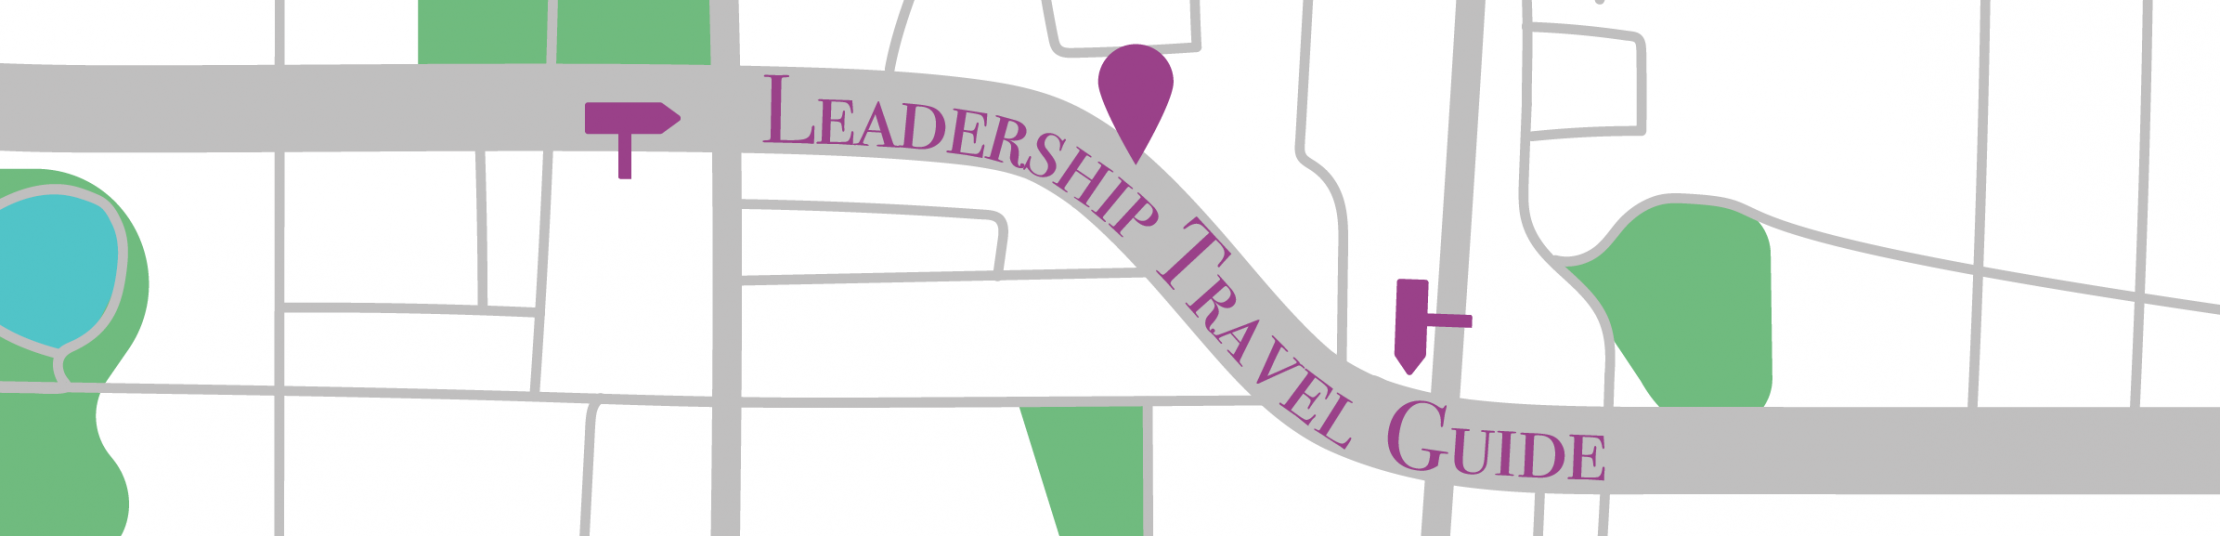 Leadership Travel Guide Newsletter by Heiko Spallek